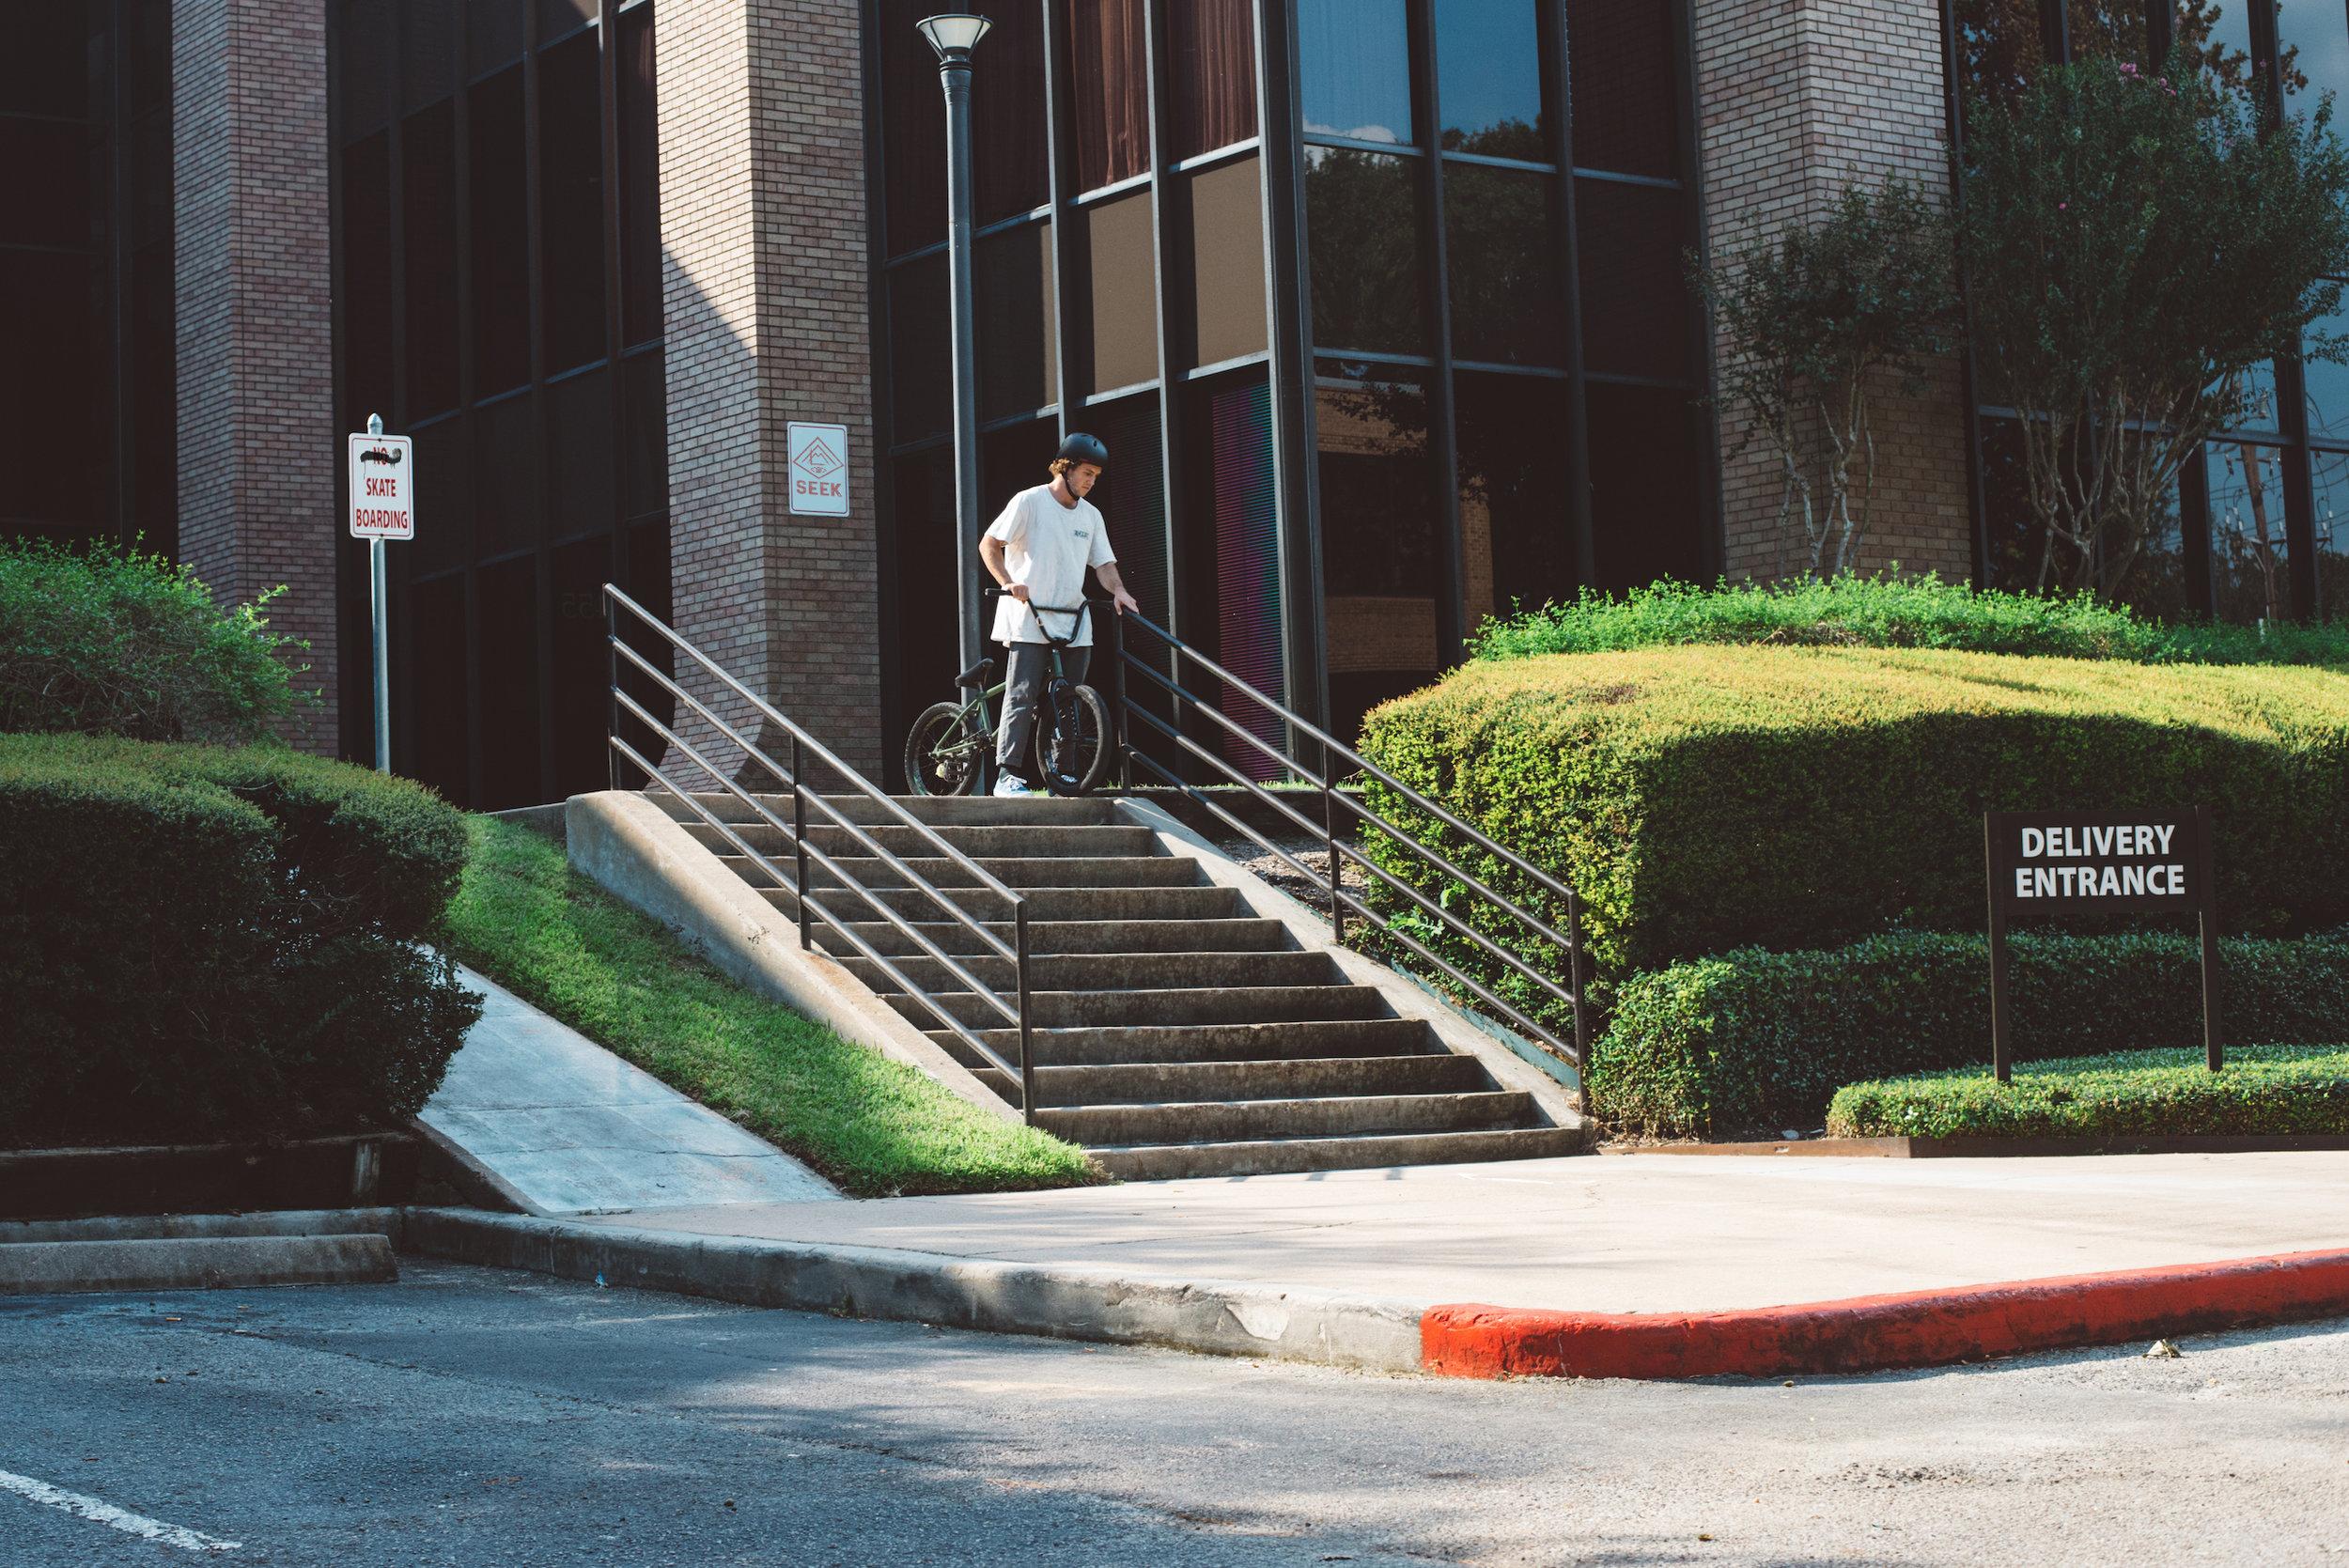 20171001 sunday street ride Kirby Crumpler_half res_1.jpg